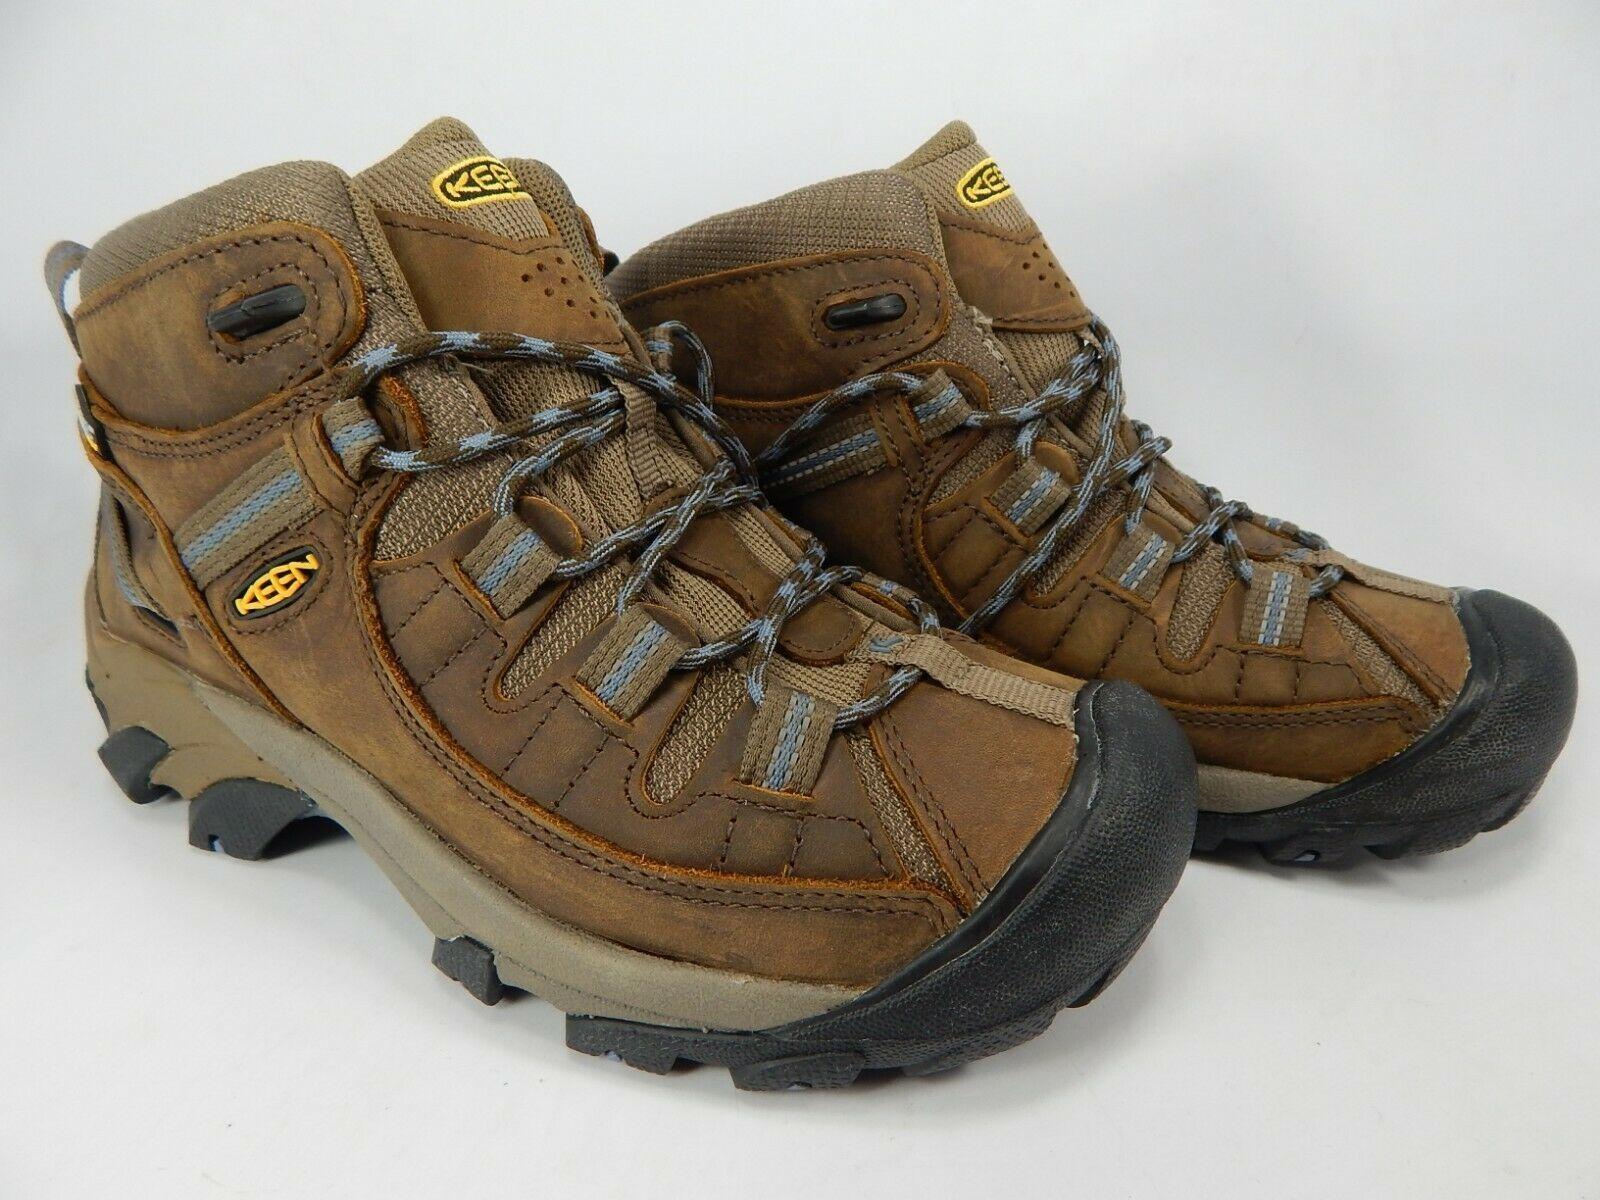 Keen Targhee II Mid Size 7 M (B) EU 37.5 Women's WP Trail Hiking Boots 1004114